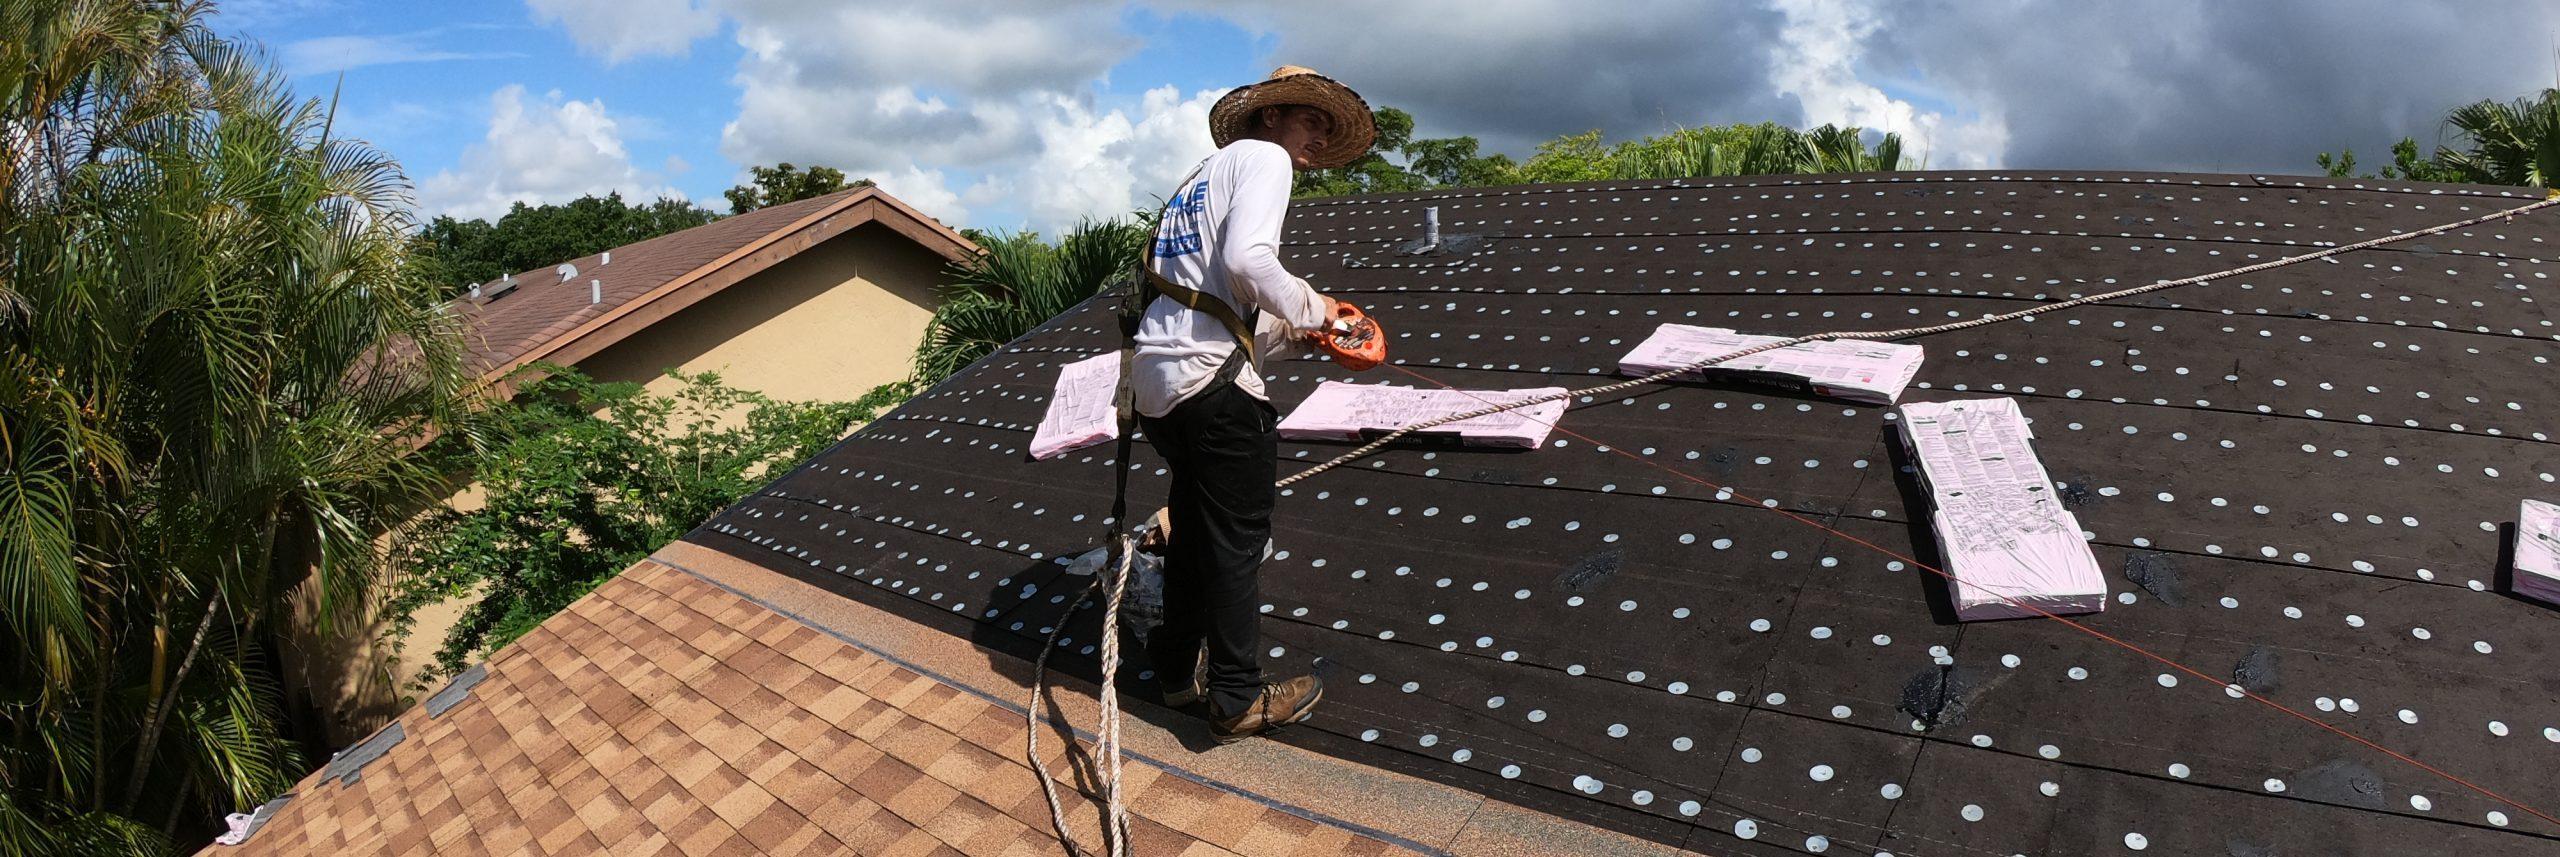 how long does a shingle roof last